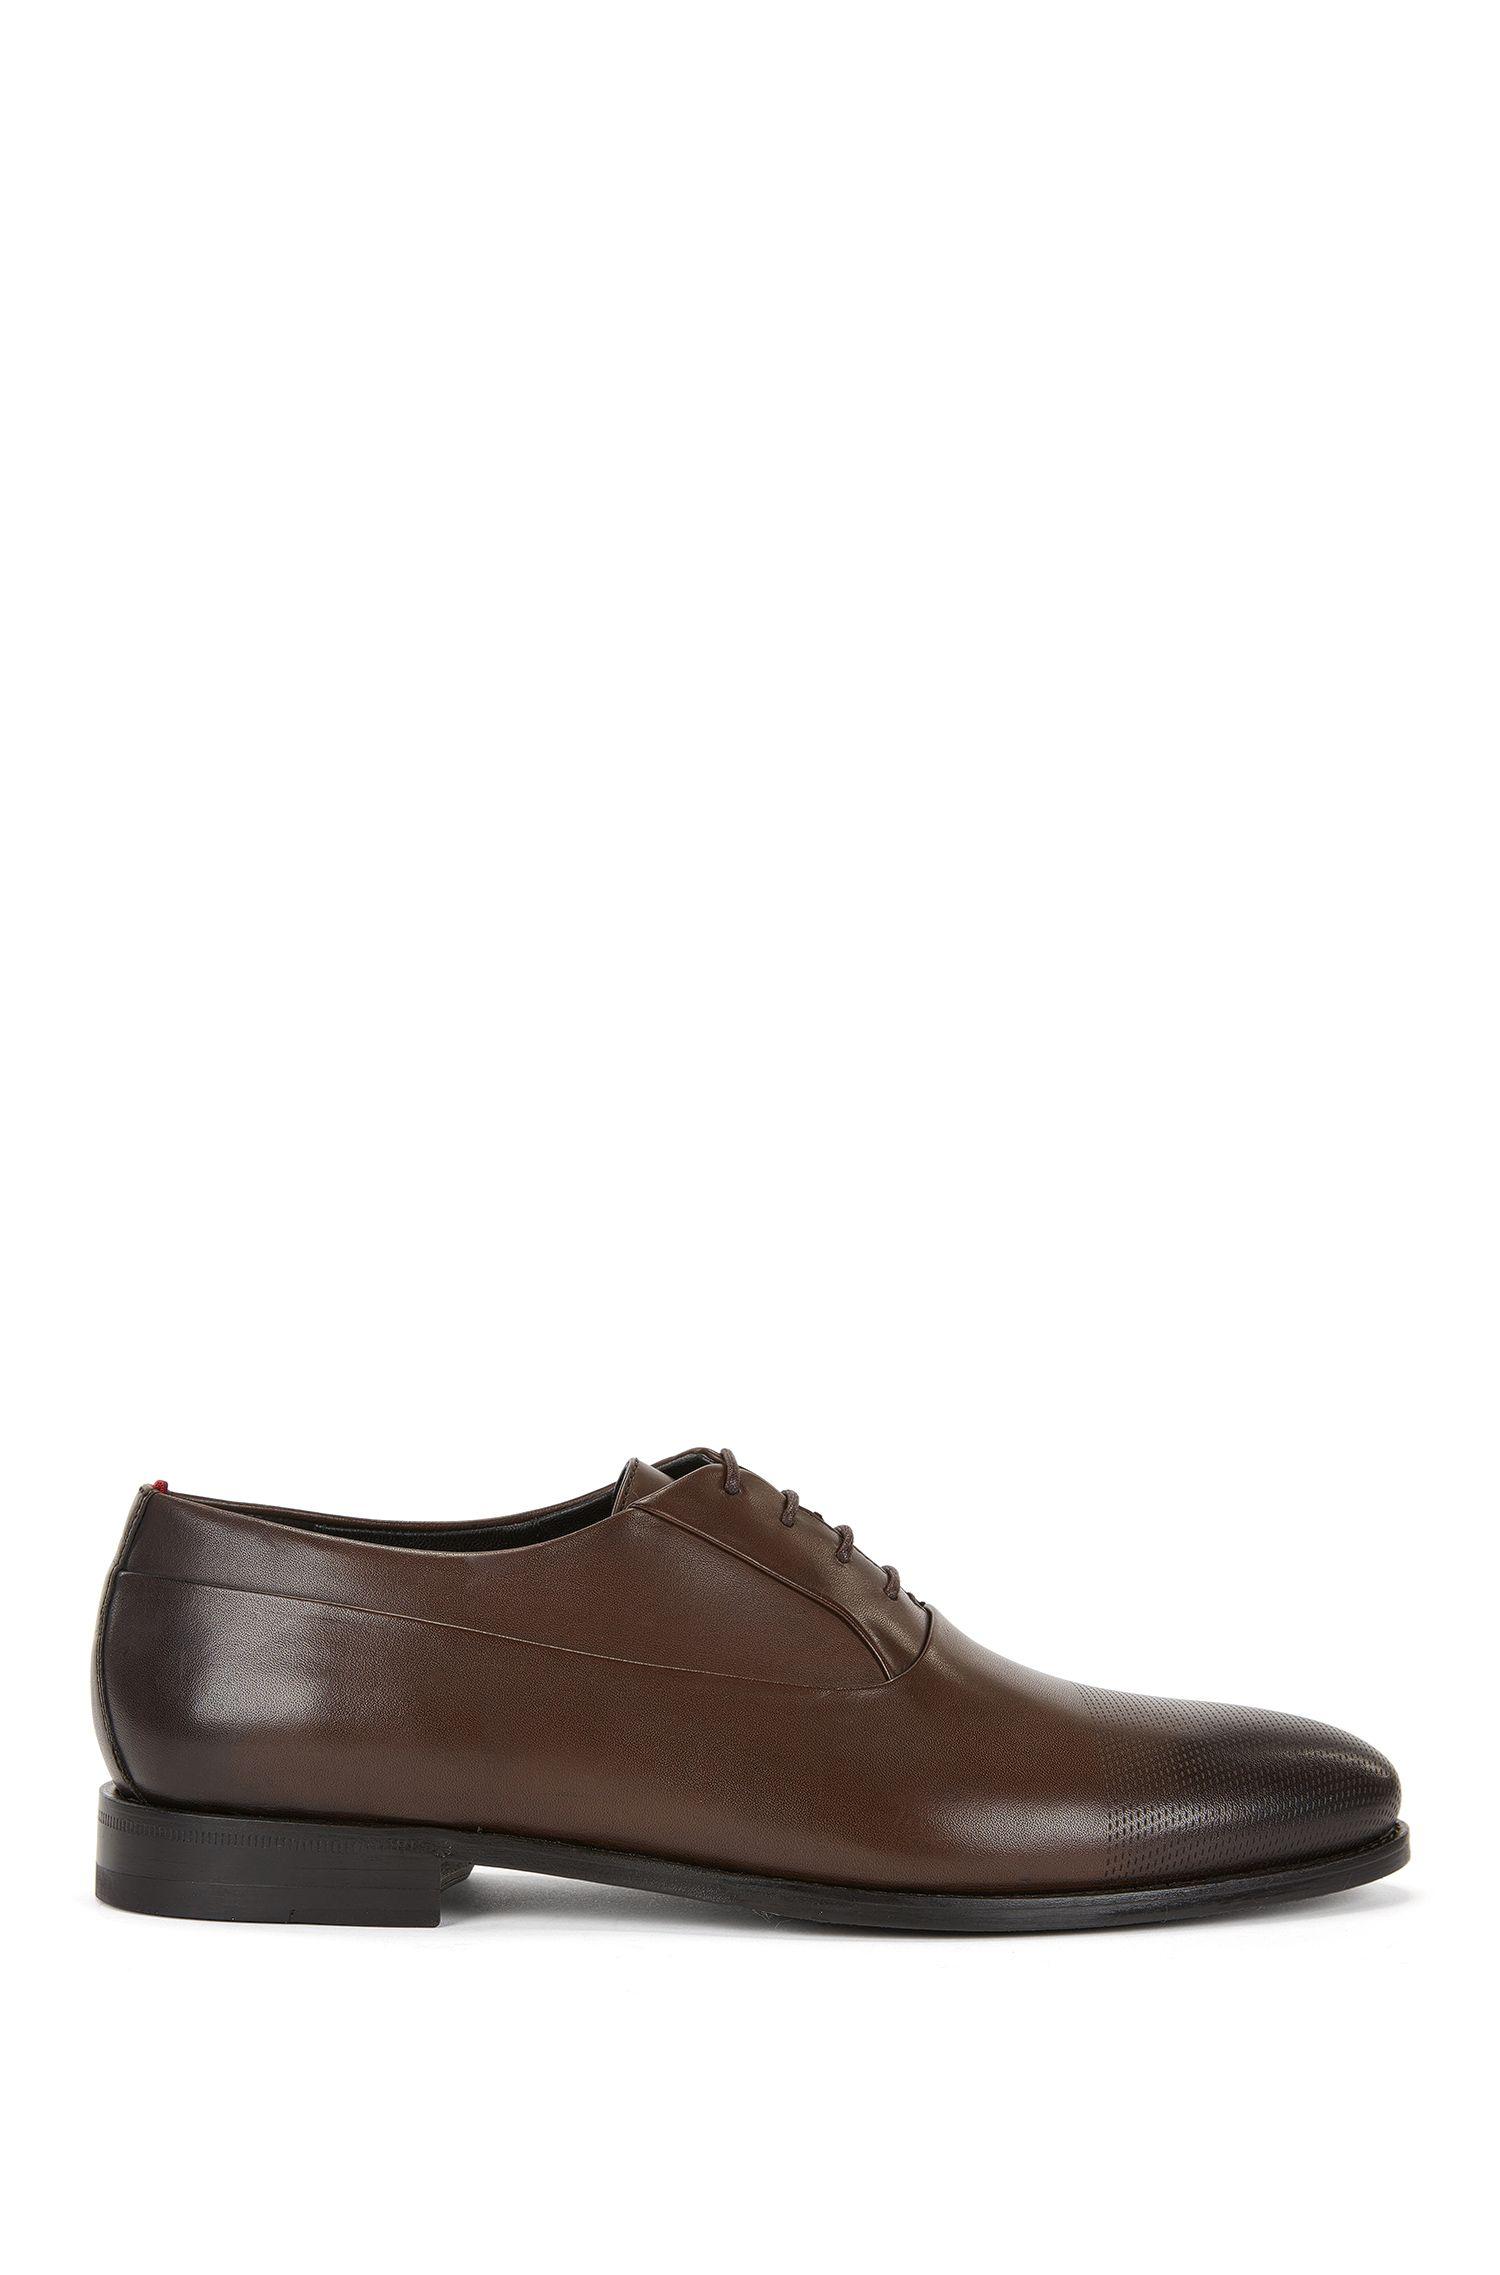 Oxford-Schuhe aus gelasertem Leder